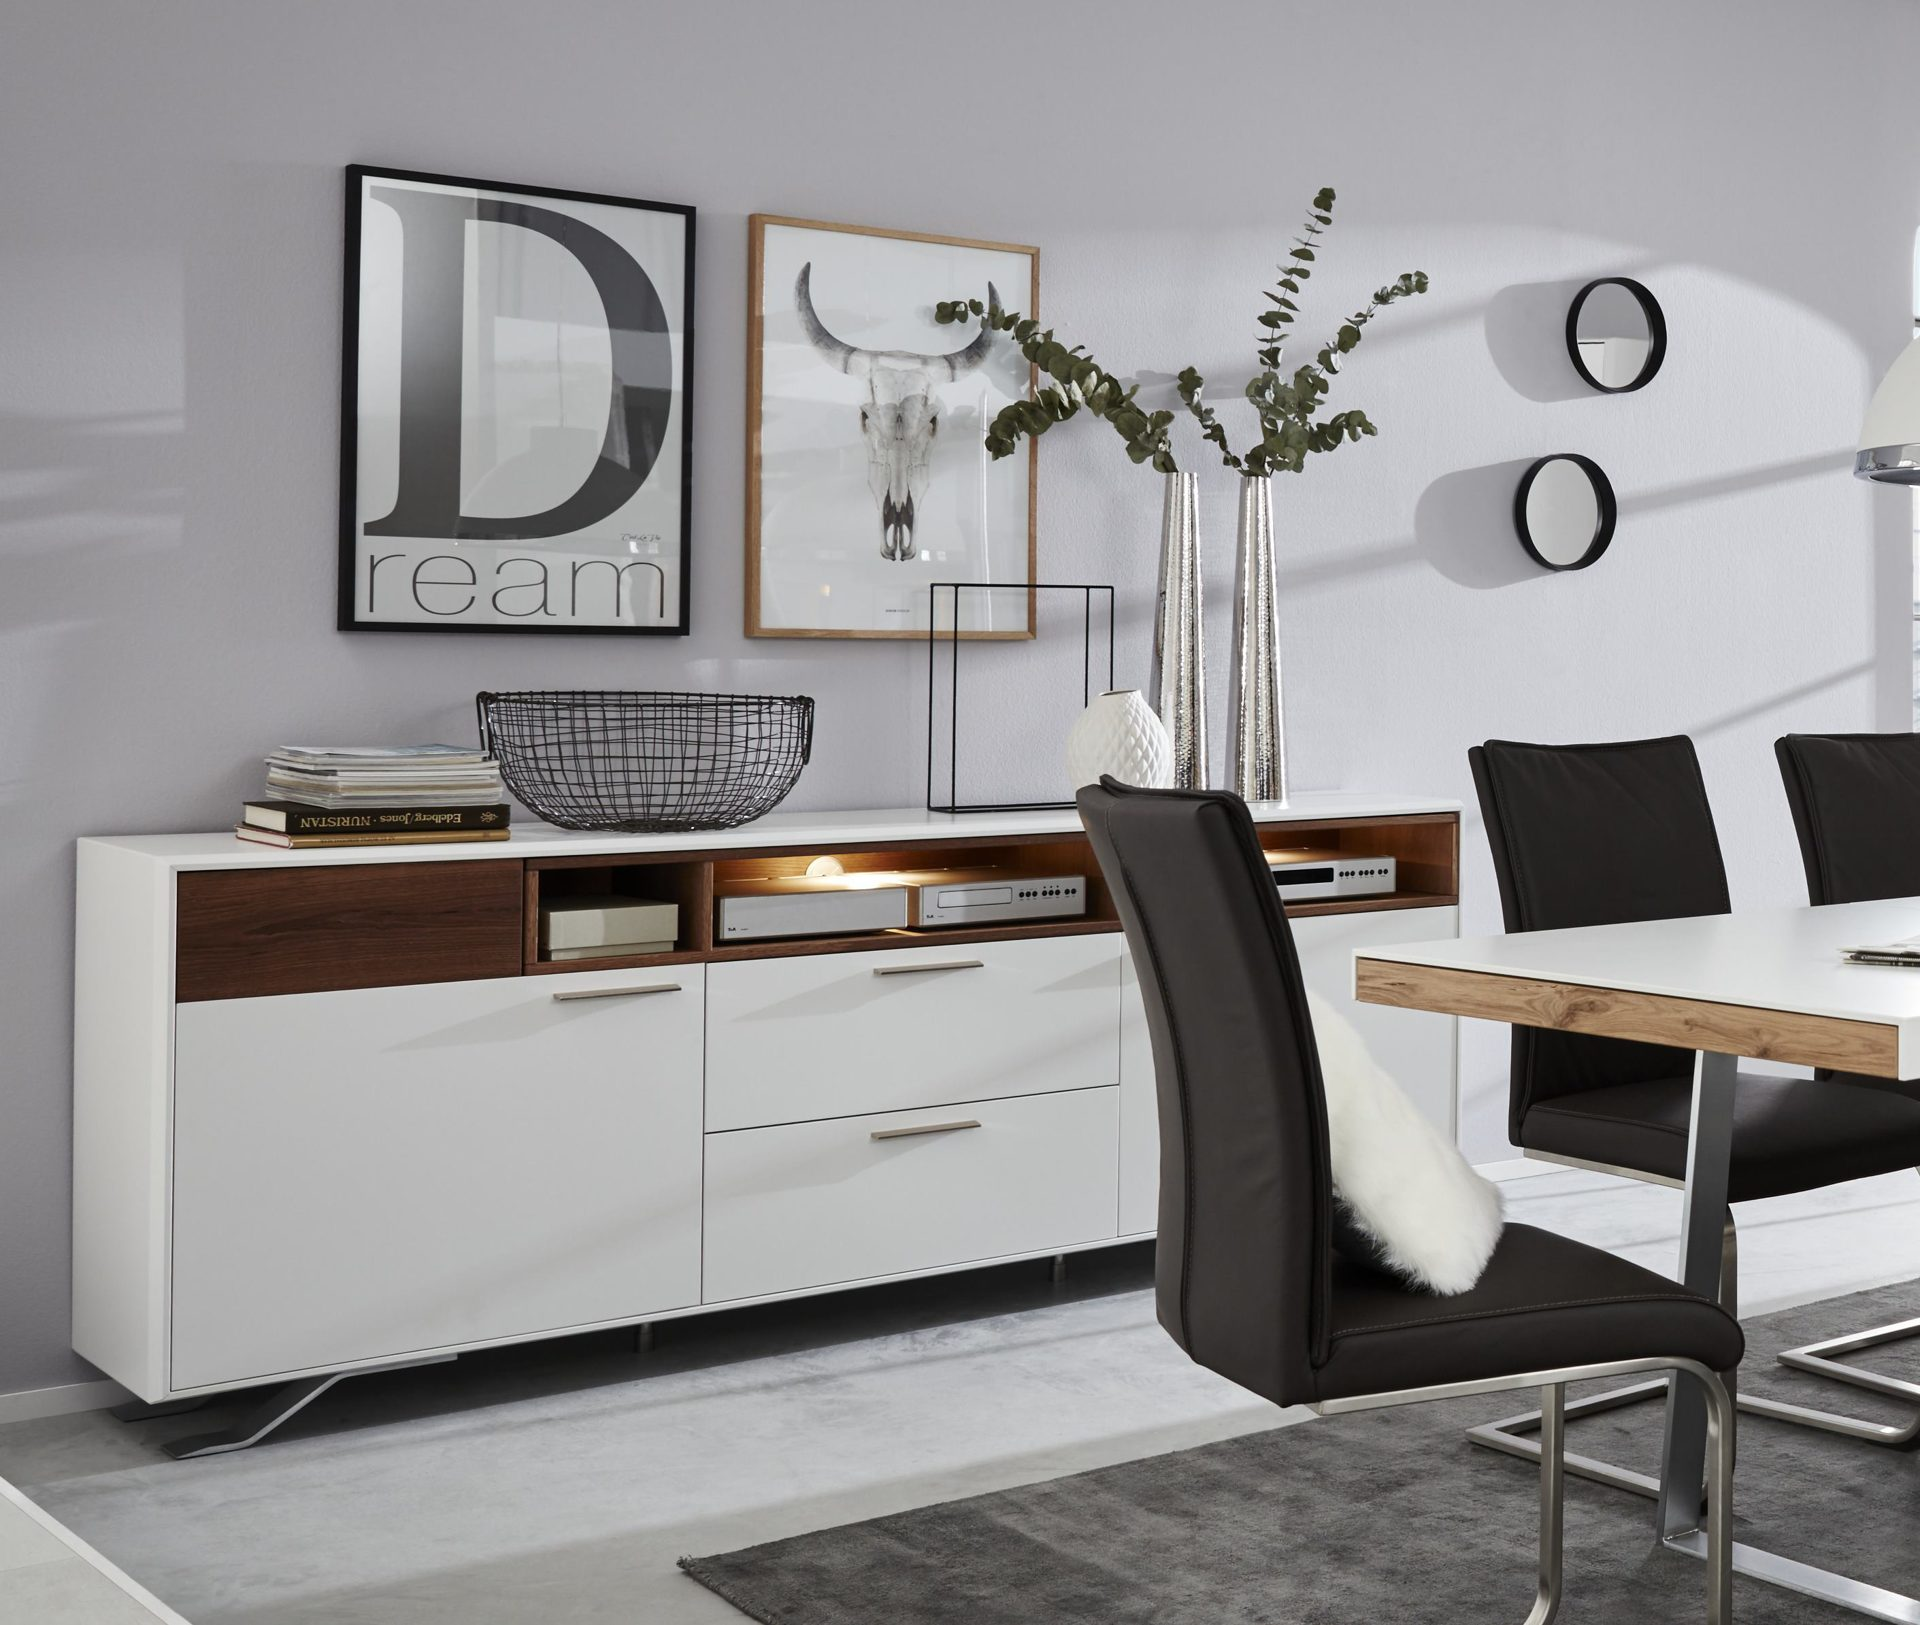 Interliving Wohnzimmer Serie 2102 – Sideboard 510366, dunkles,